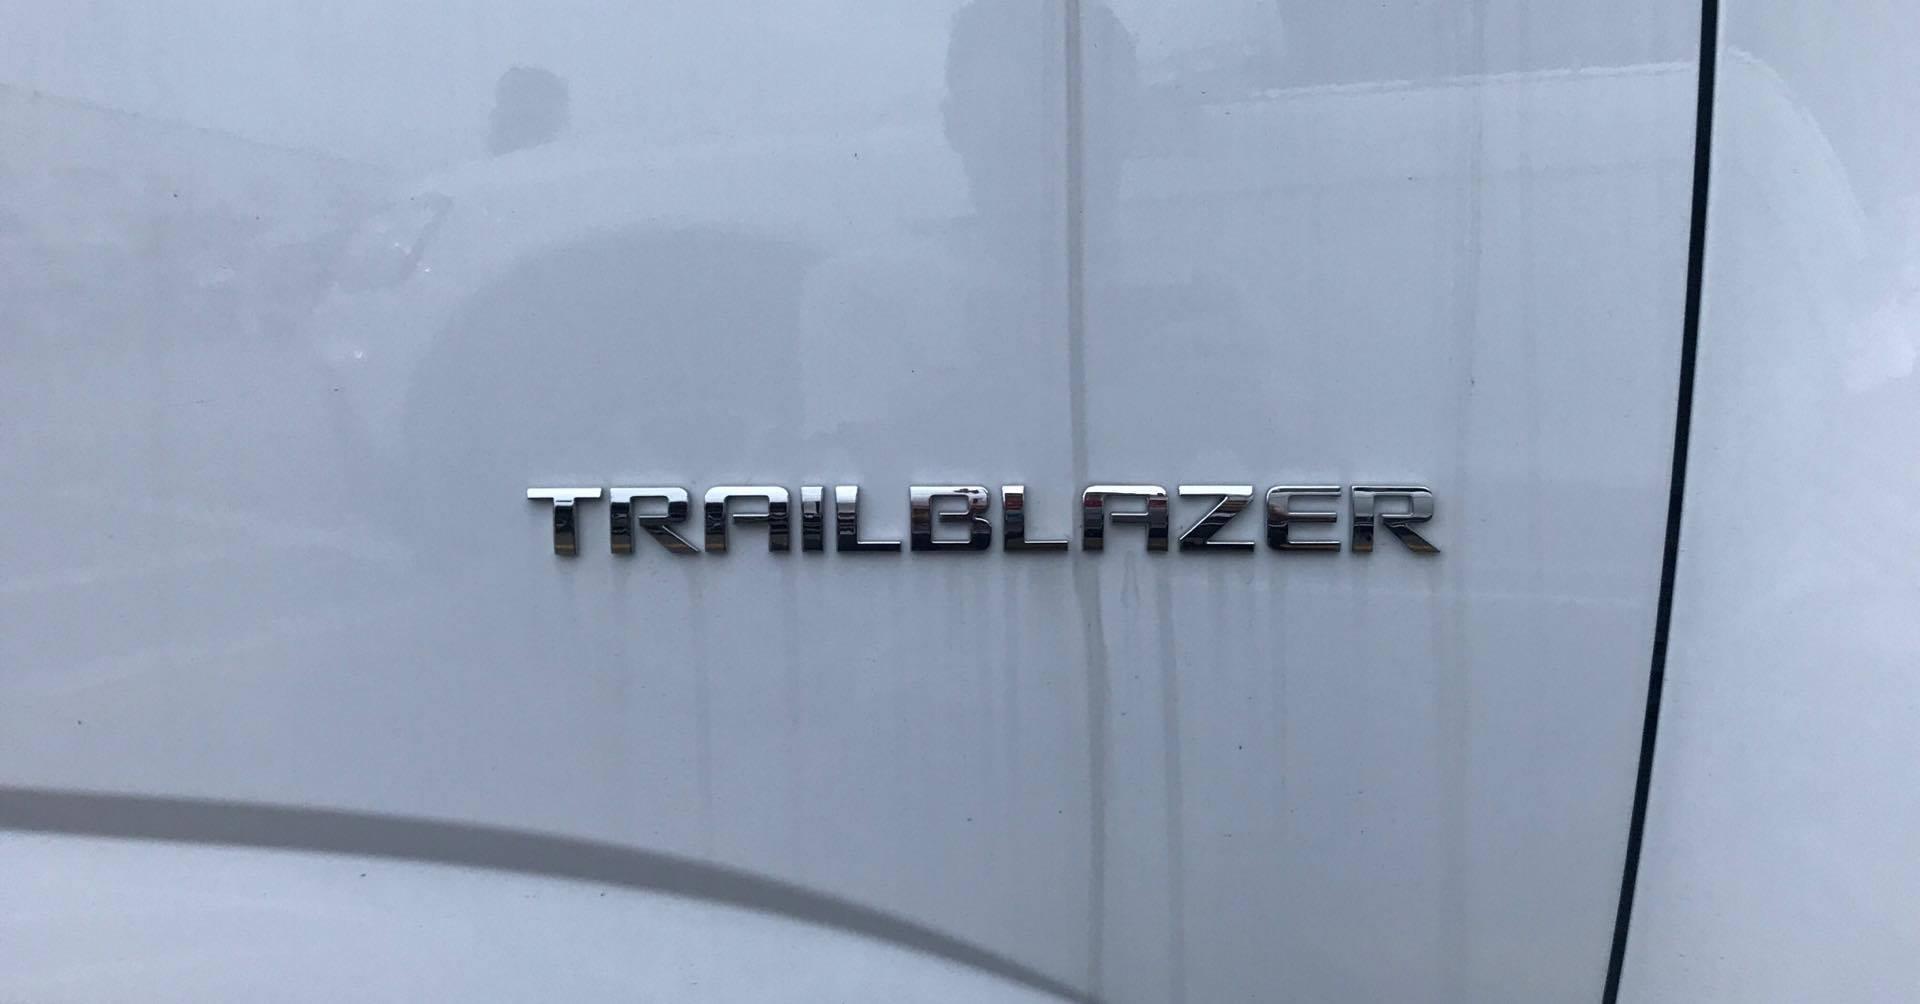 Chevrolet Trailblazer SUV 7 chỗ phân phối Việt NamChevrolet Trailblazer SUV 7 chỗ phân phối Việt Nam